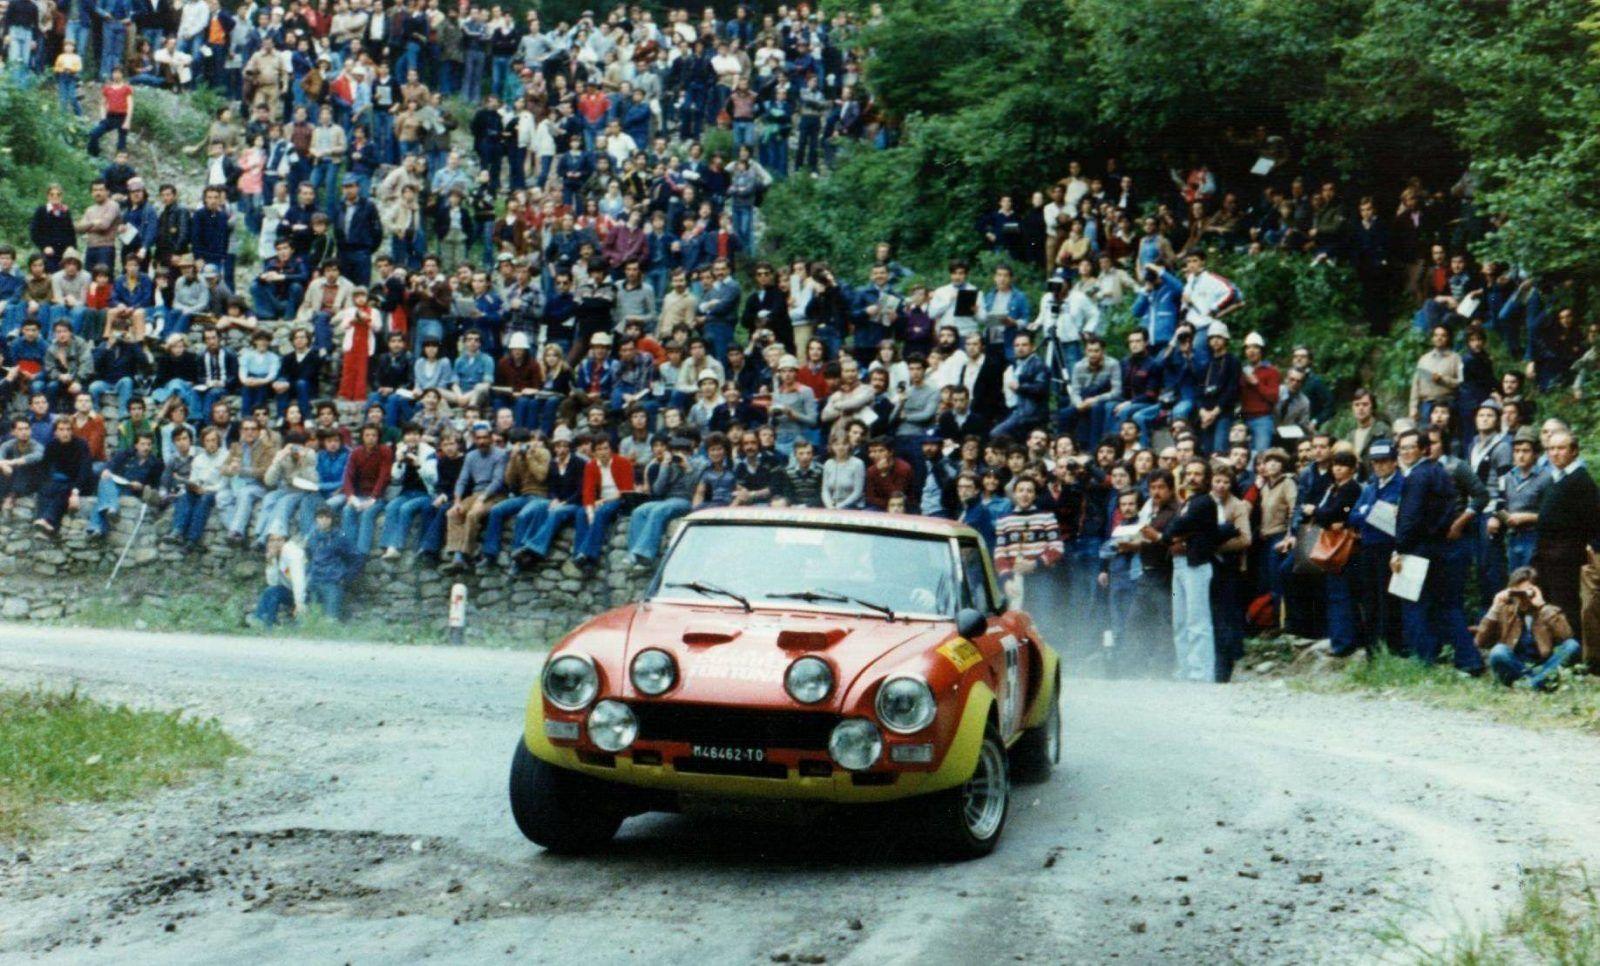 Ex Works 1975 Fiat Abarth 124 Rallye Group 4 Spider Con Immagini